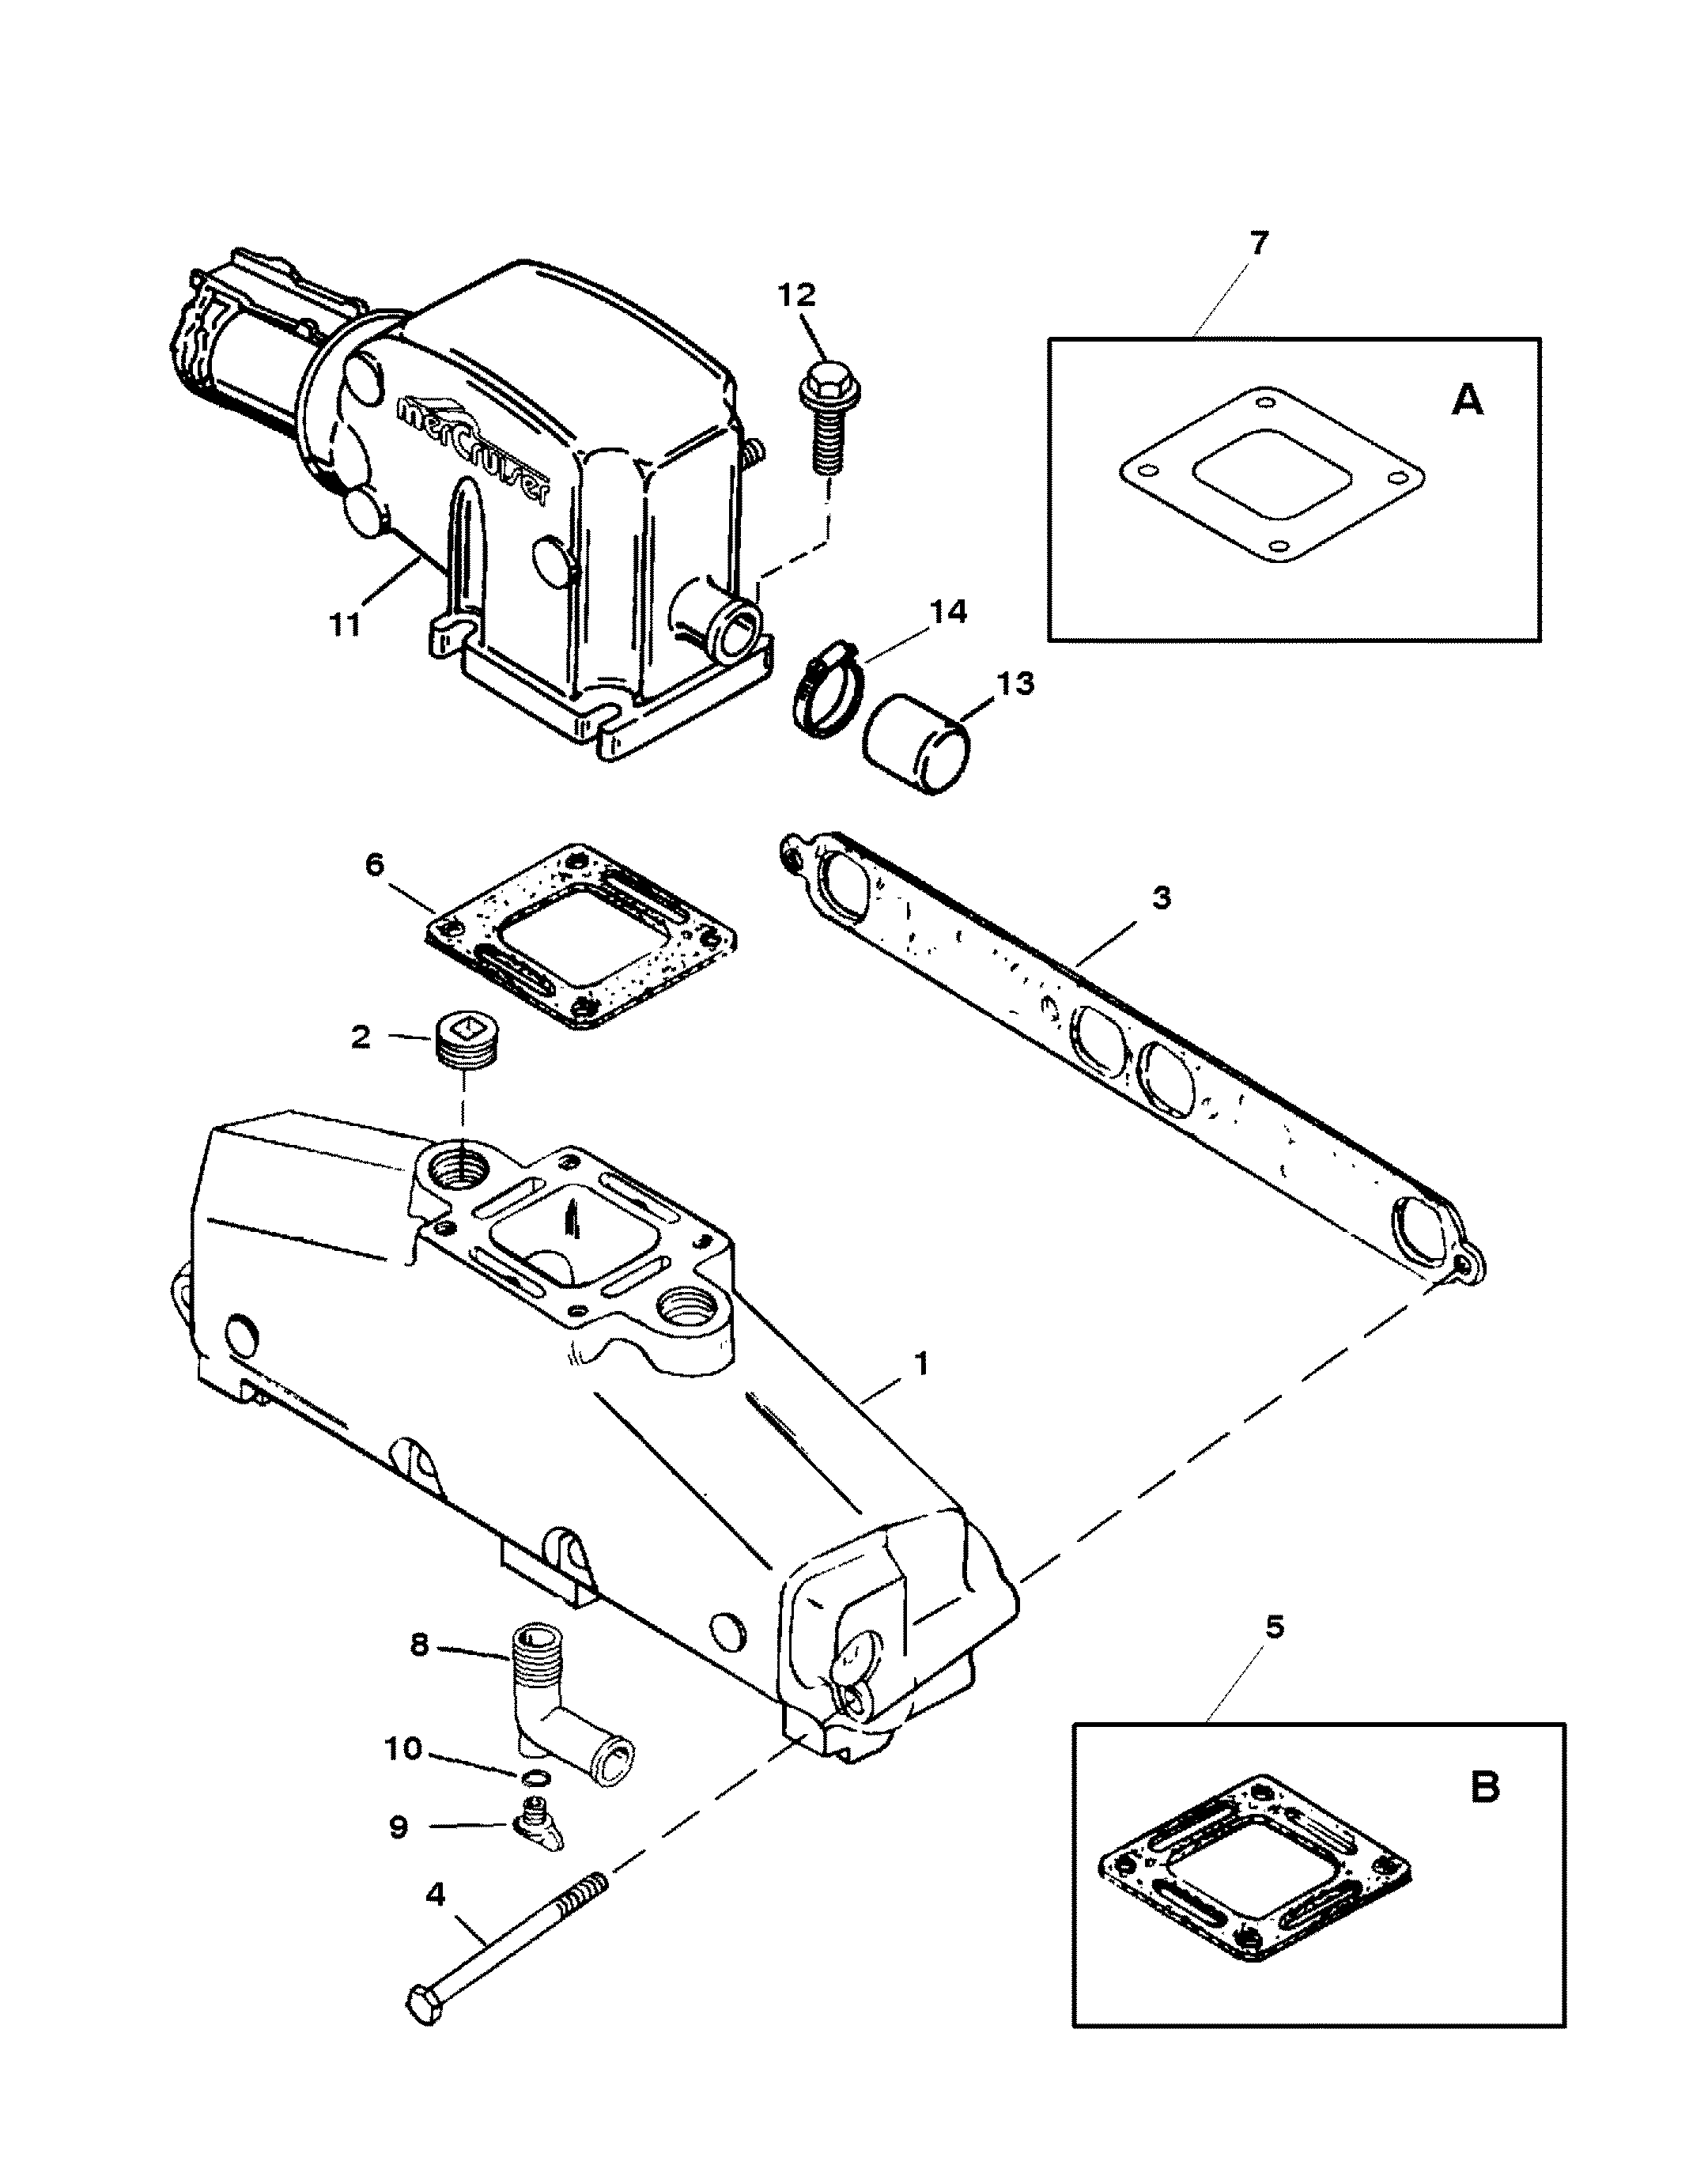 gm 3 8 engine diagram exhaust wiring library 5 7lx bravo efi gen gm 350 v 8 1997 serial